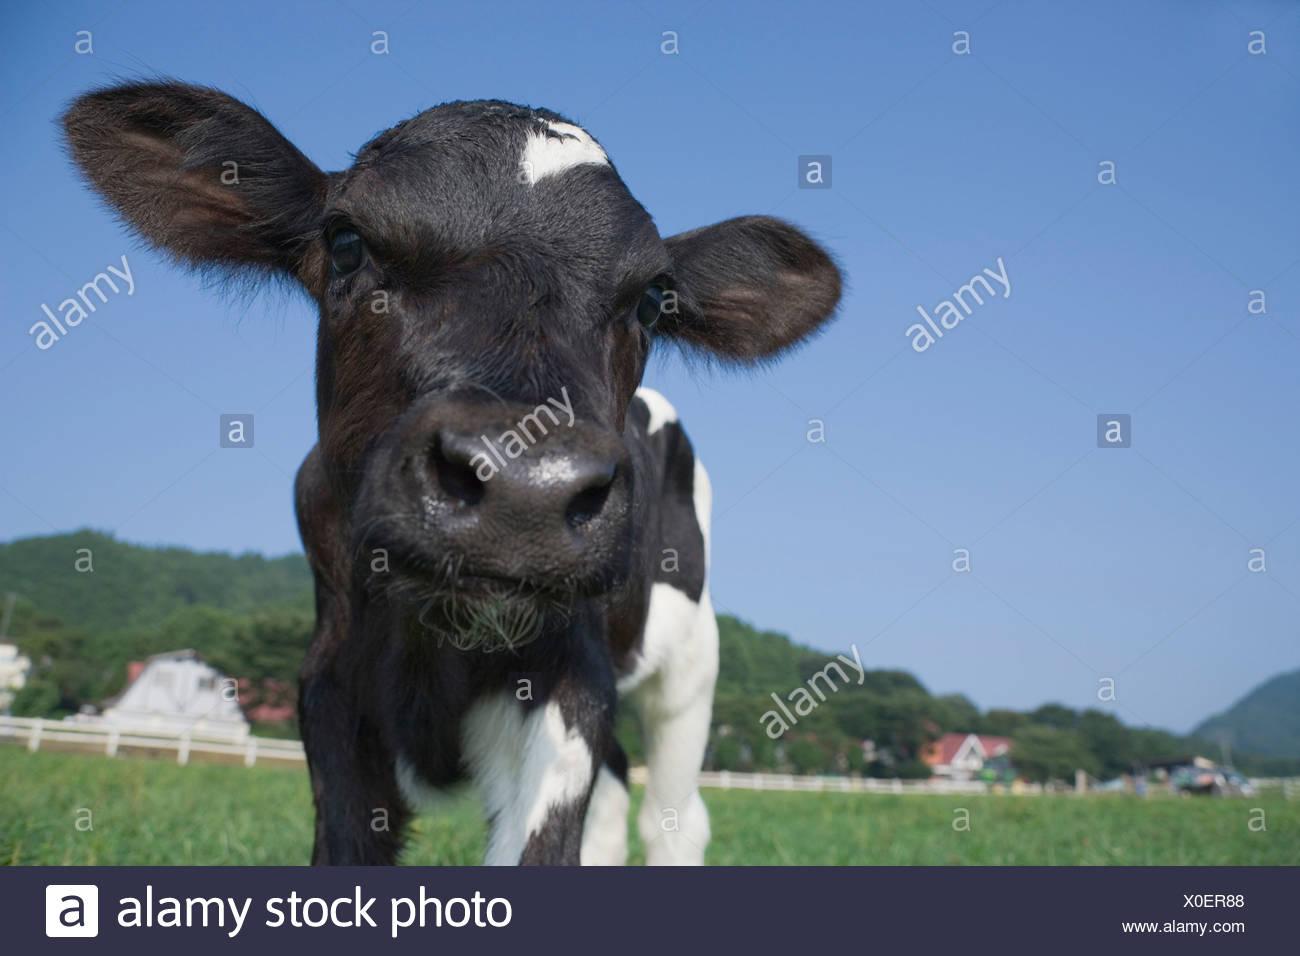 One calf standing - Stock Image